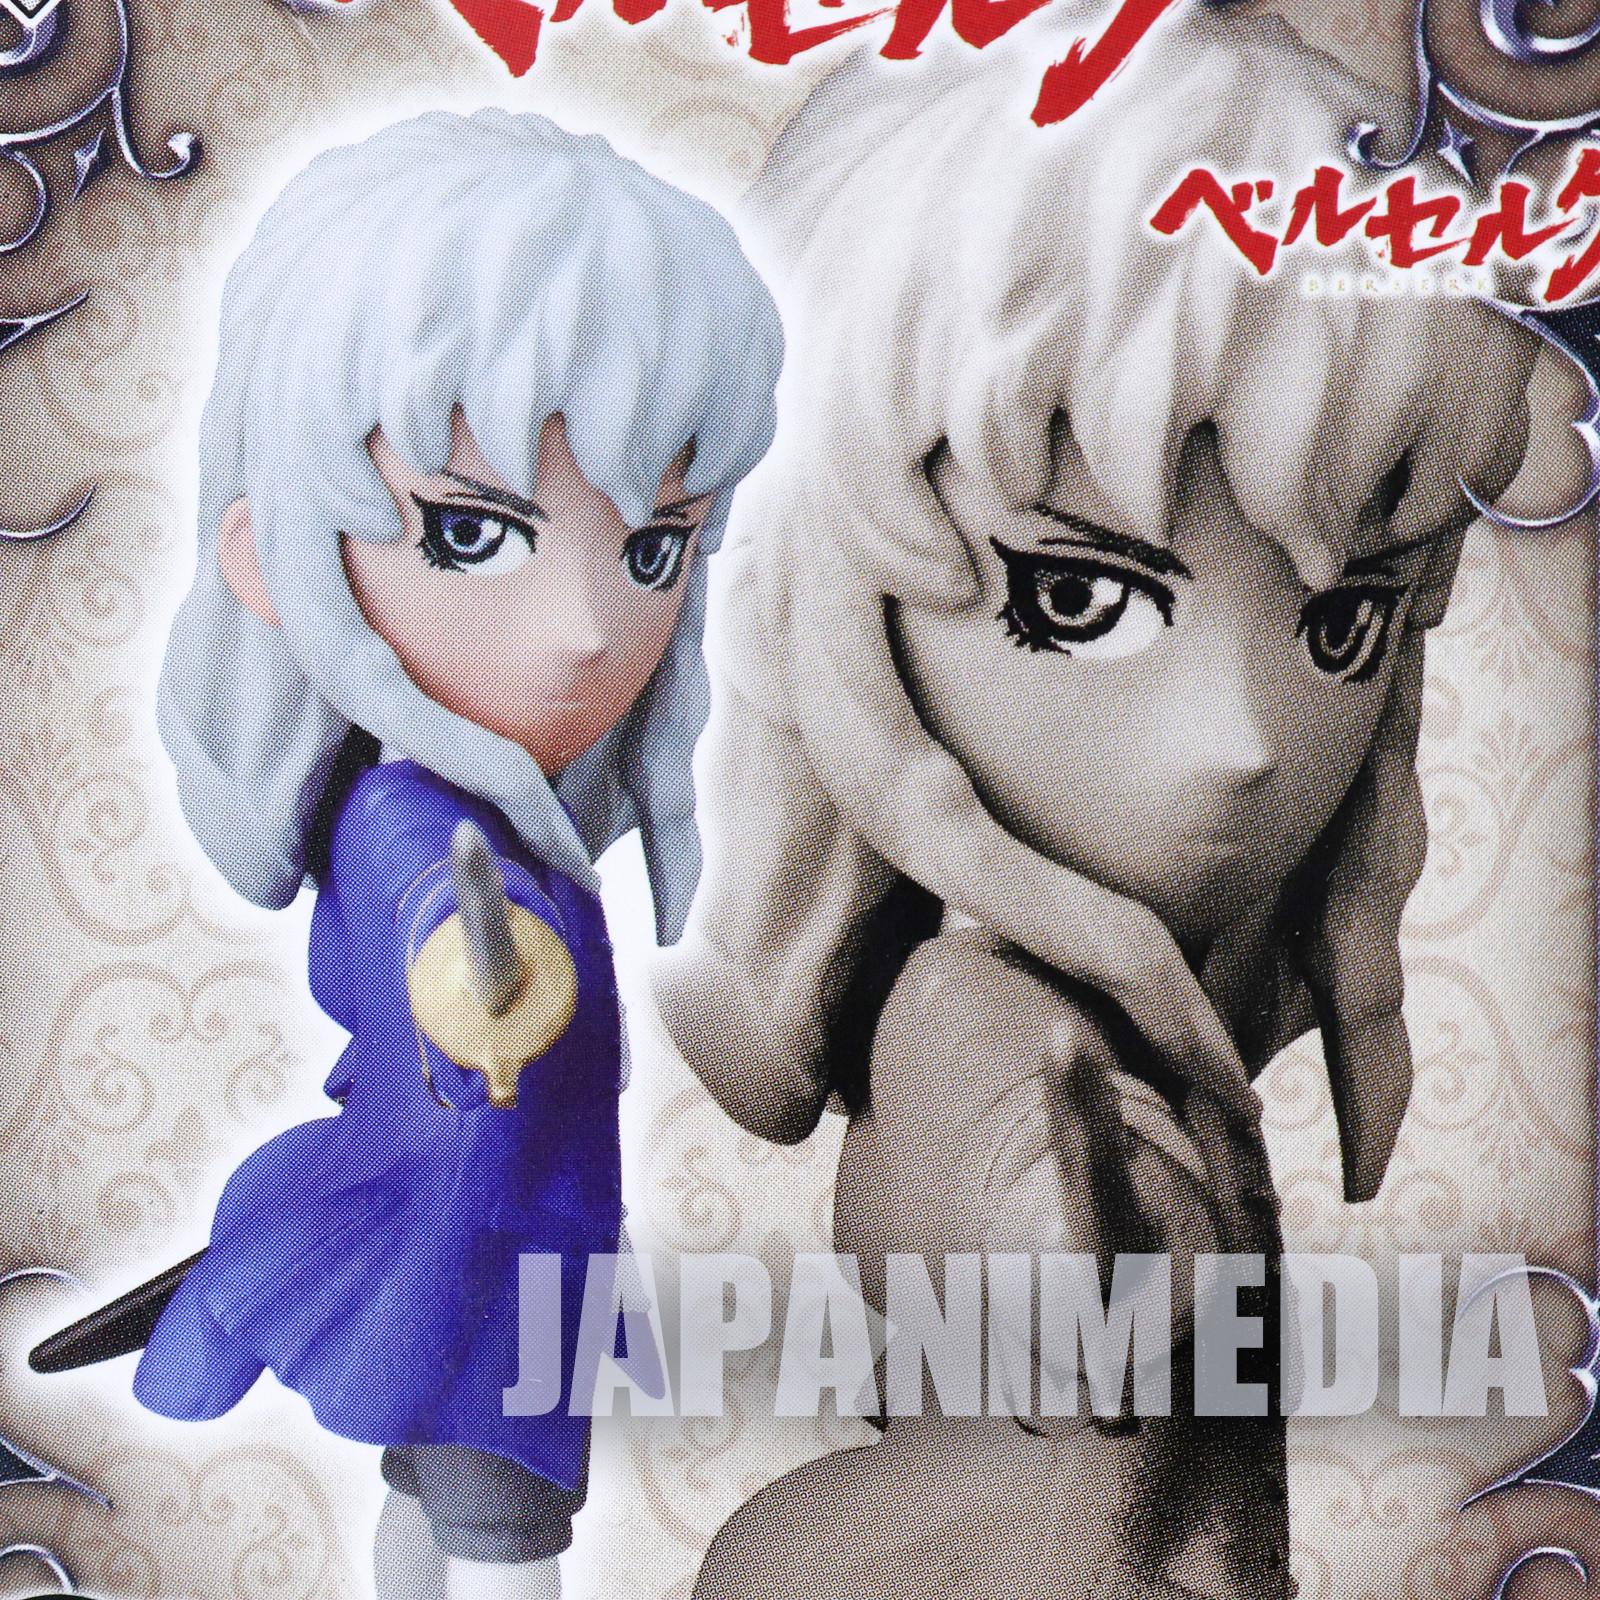 Berserk Griffith Card Stand Figure Banpresto JAPAN ANIME